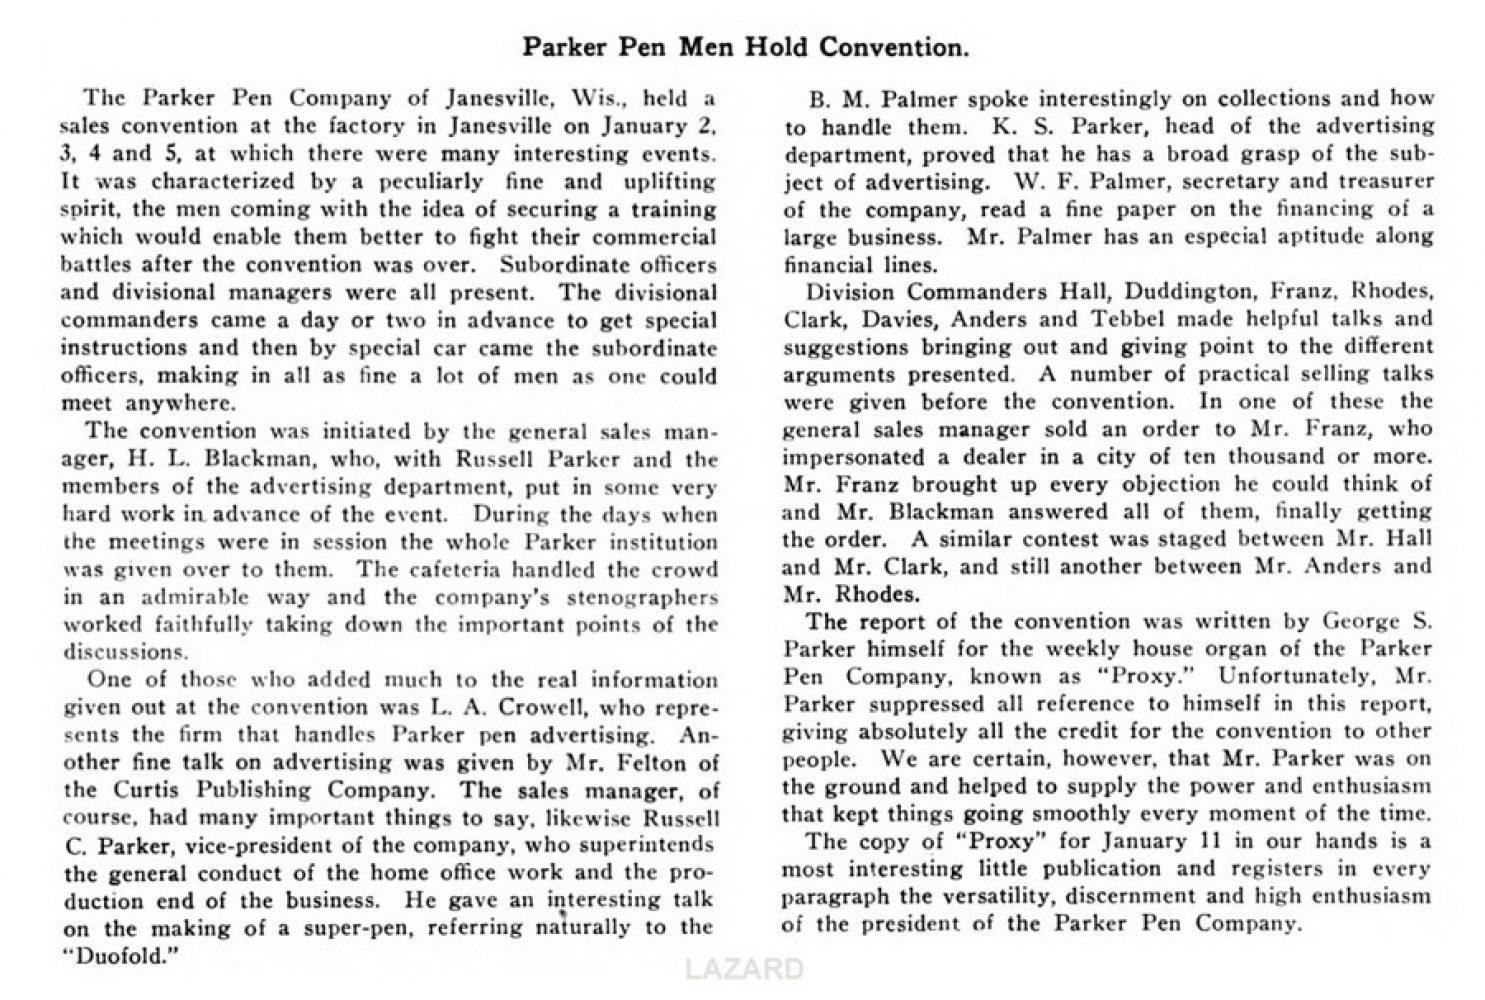 1923 01 01 Parker Convention text Lazard